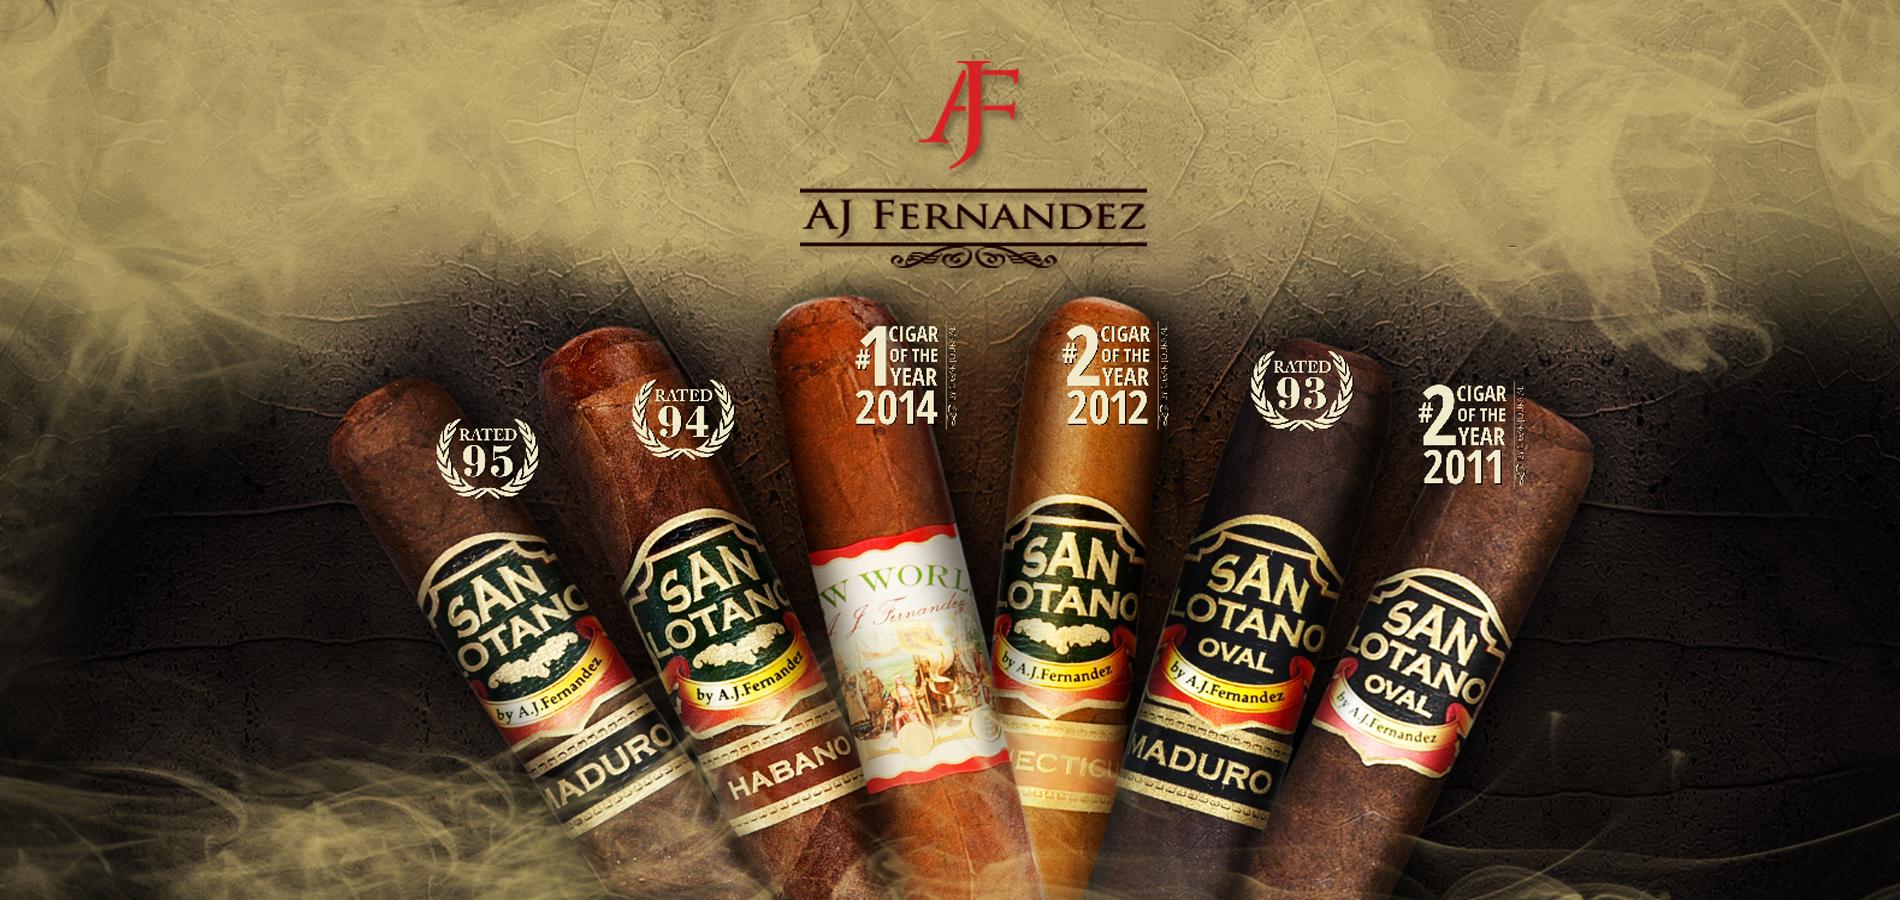 AJ-Fernandez-Cigars-Tampa-Florida-Area